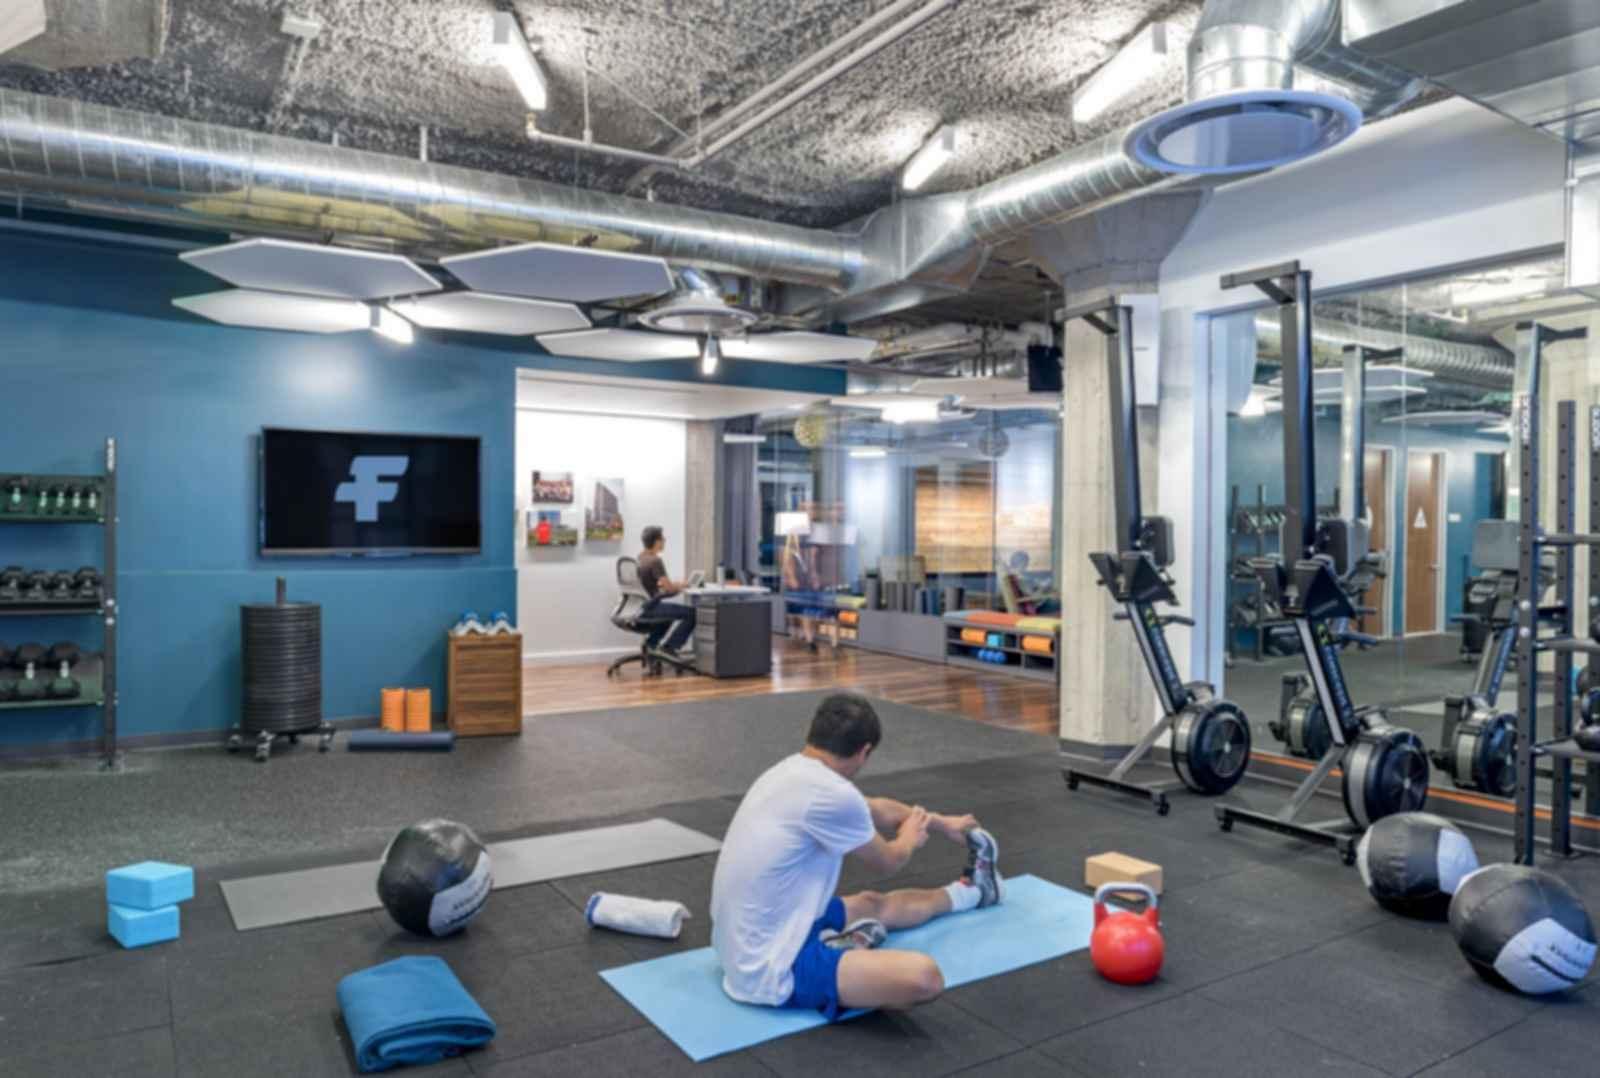 Twitter Headquarters - Gym